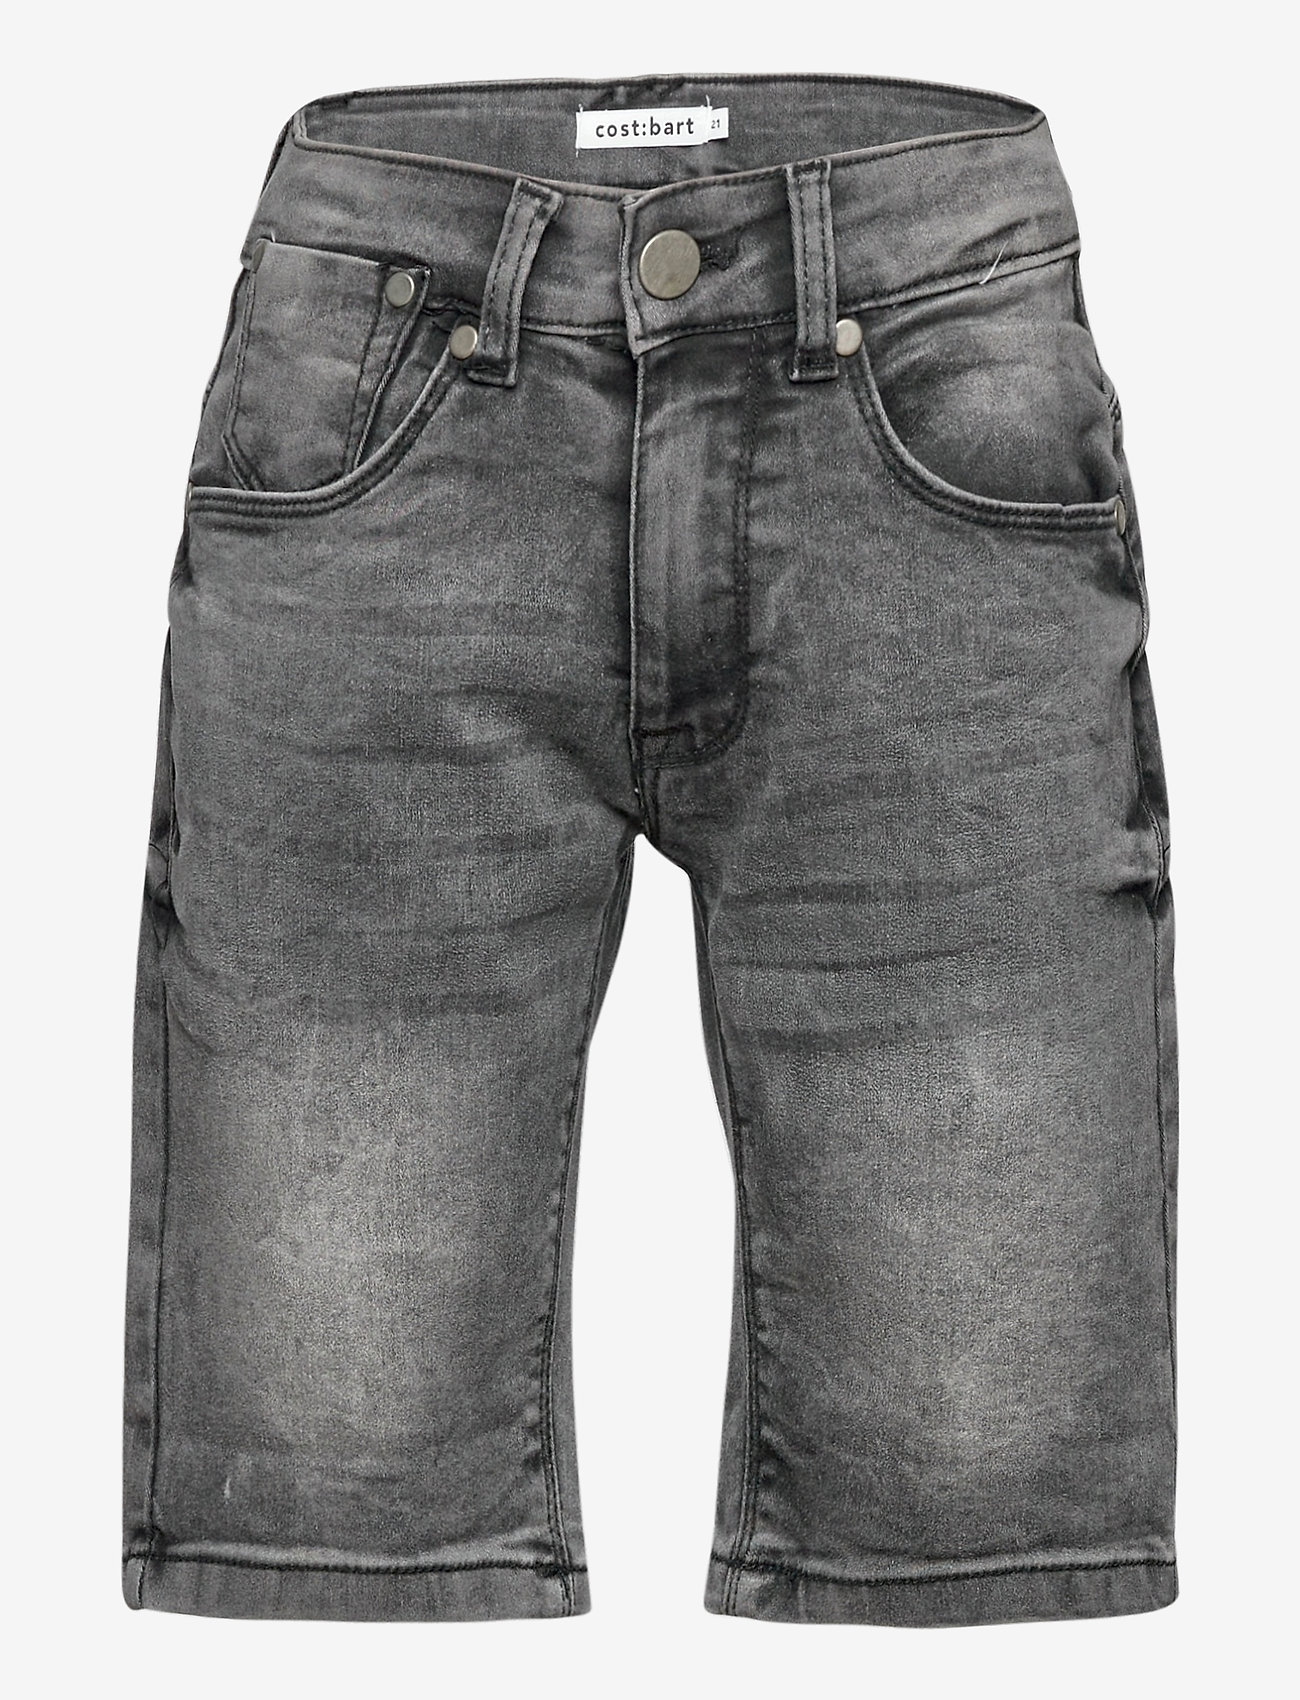 Costbart - SAM SHORTS DARK GREY WASH NOOS - shorts - dark grey denim wash - 0